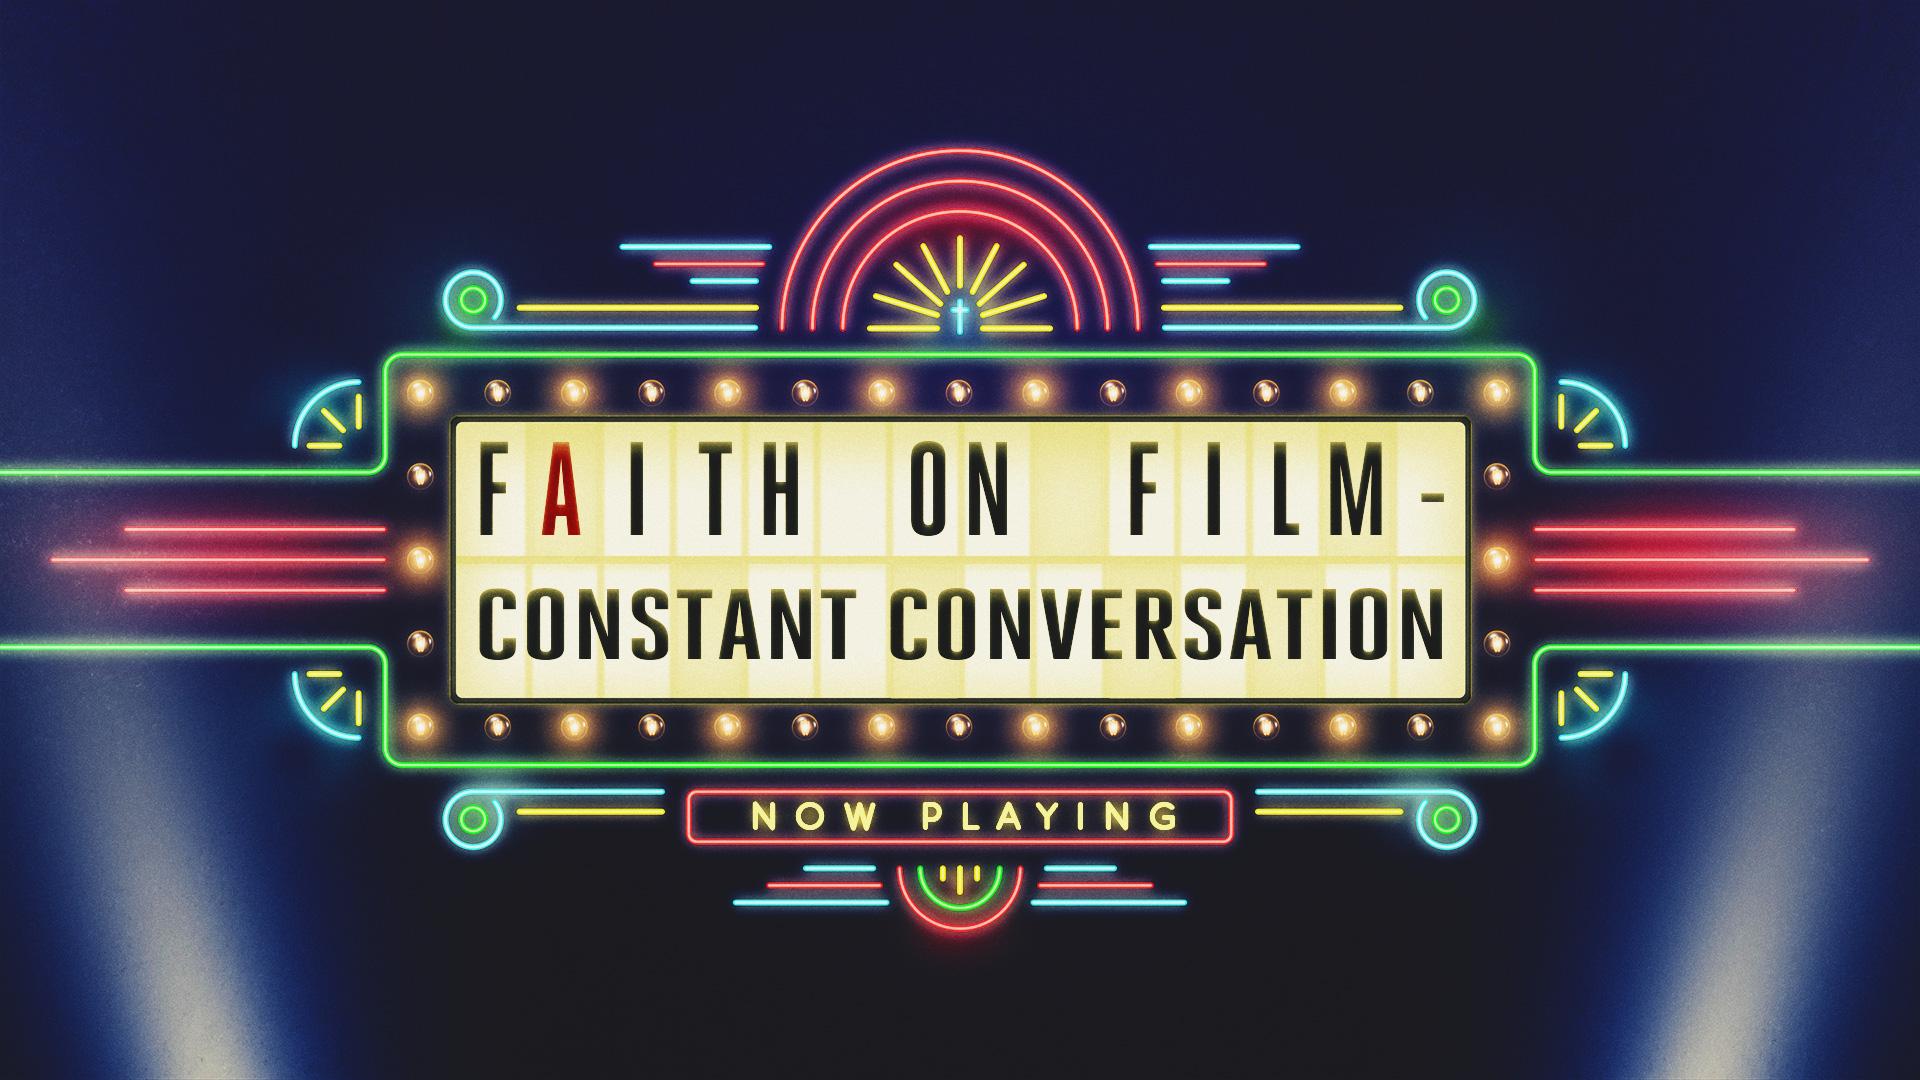 Constant Conversation